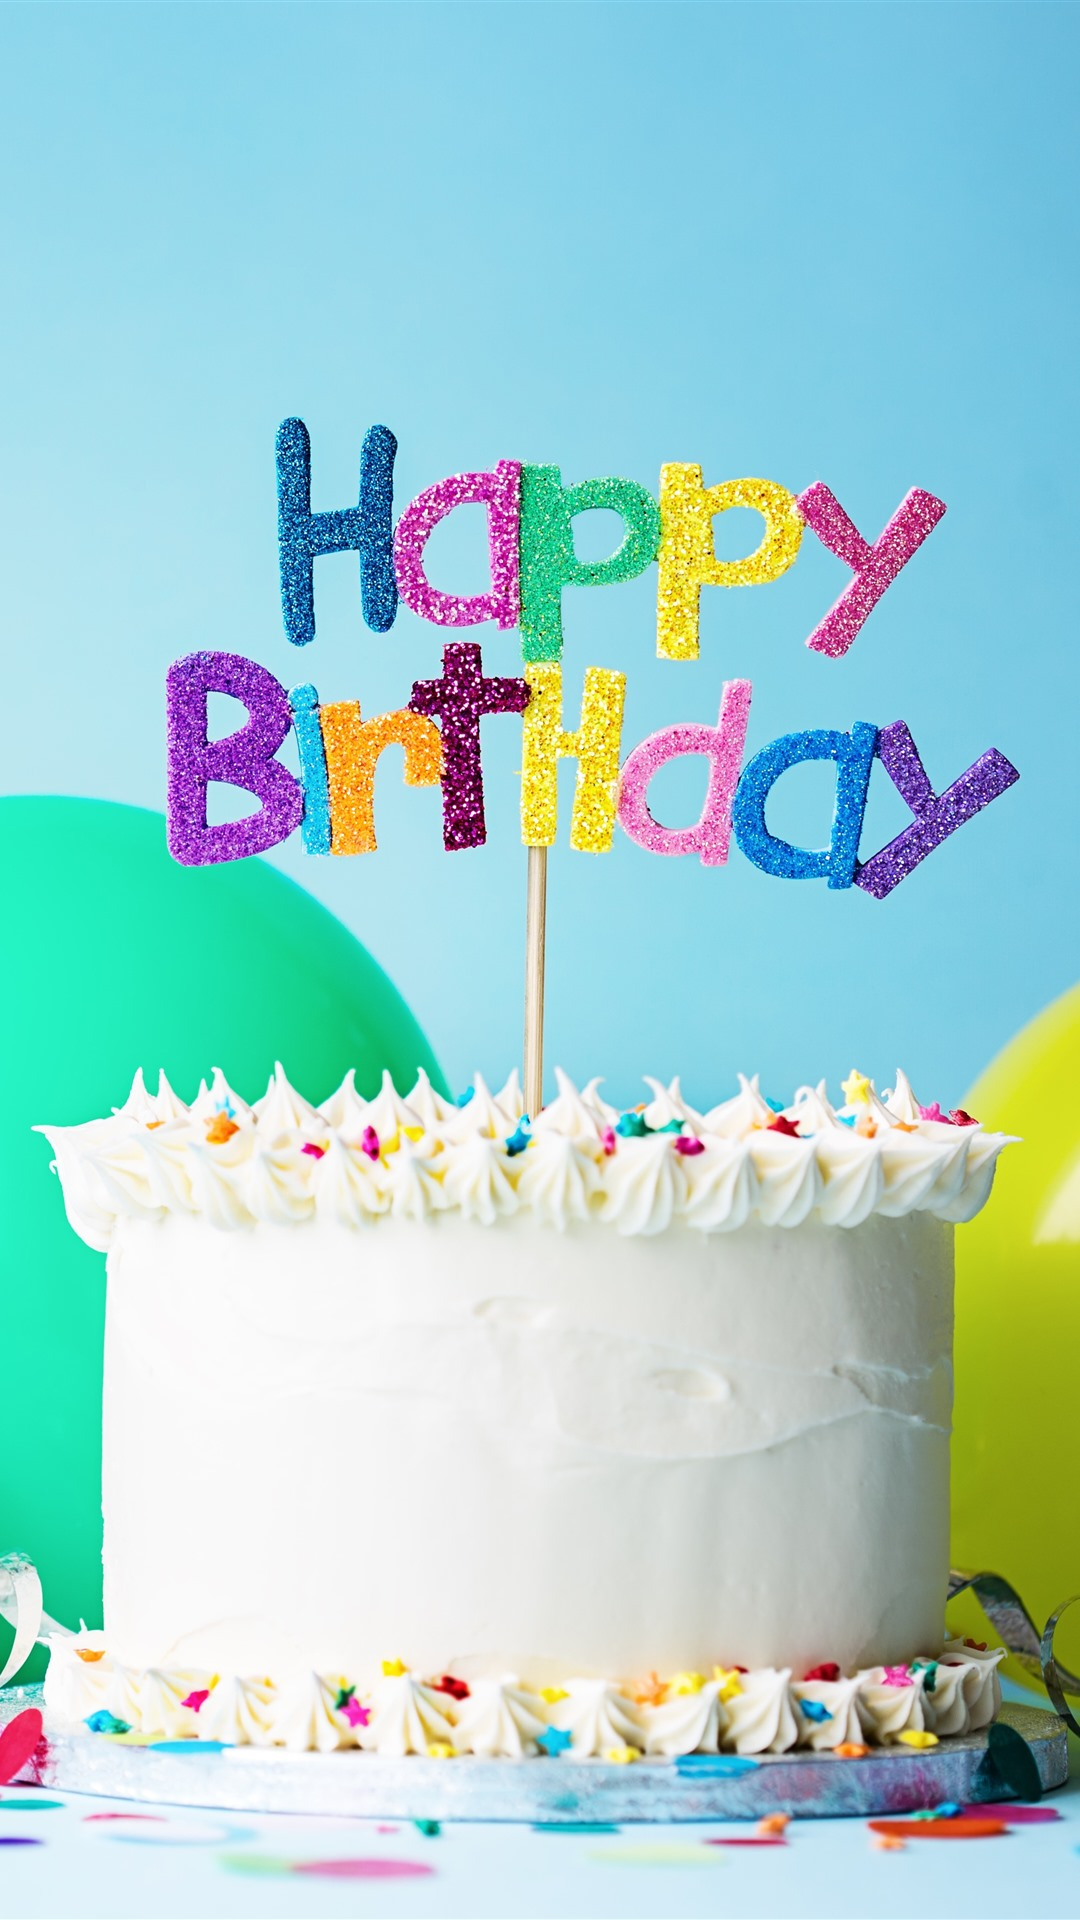 Astonishing Happy Birthday Cake Hat Balloon Ribbon 1242X2688 Iphone 11 Pro Funny Birthday Cards Online Aboleapandamsfinfo